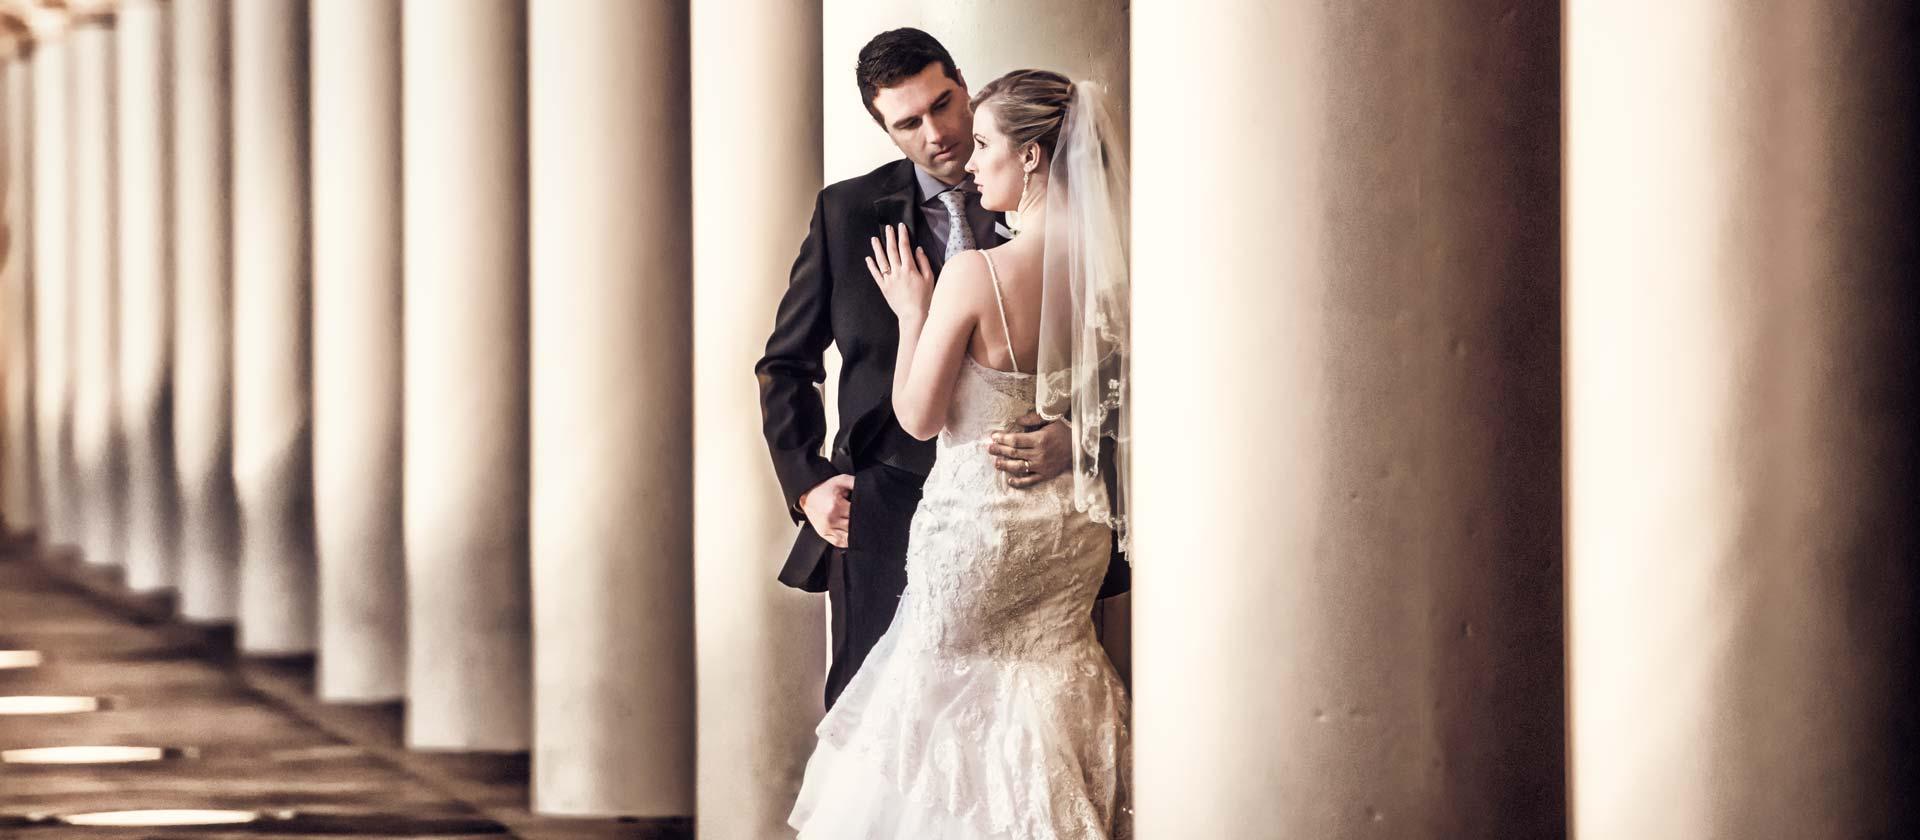 las-vegas-wedding-photographers-12